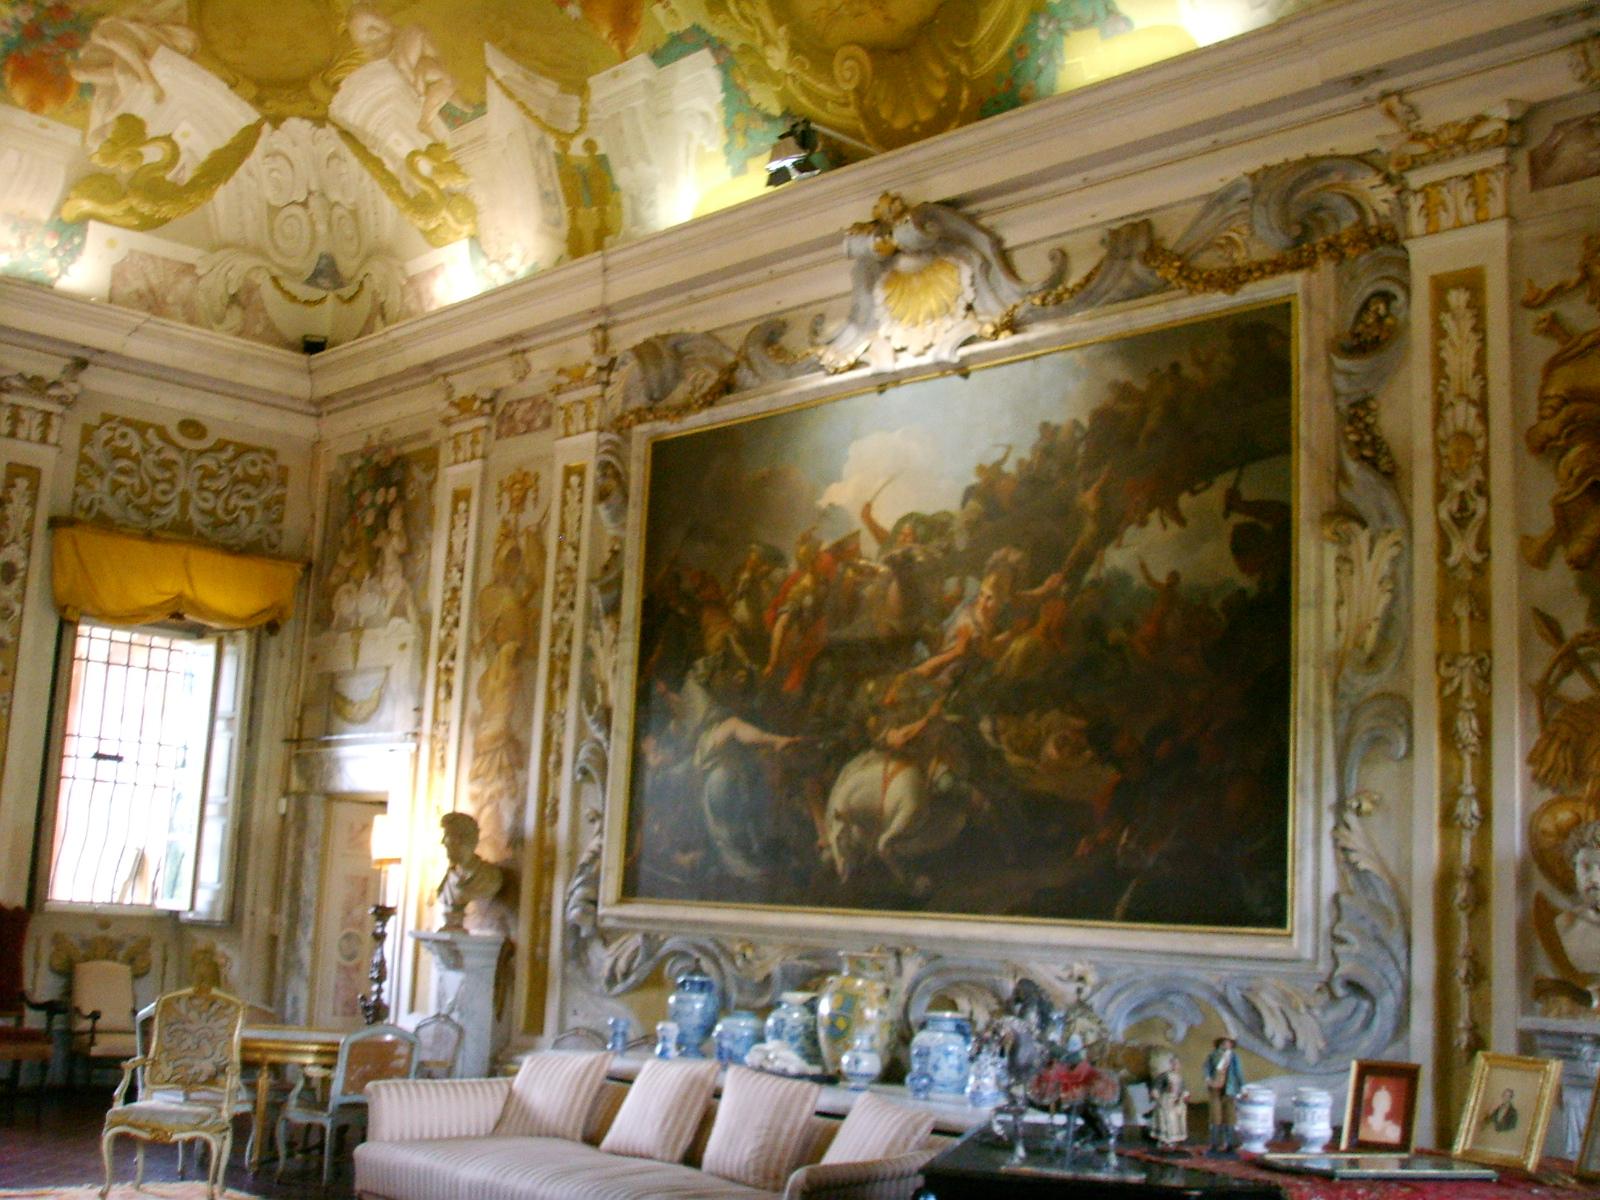 File:Villa torrigiani di lucca, interno 01.JPG